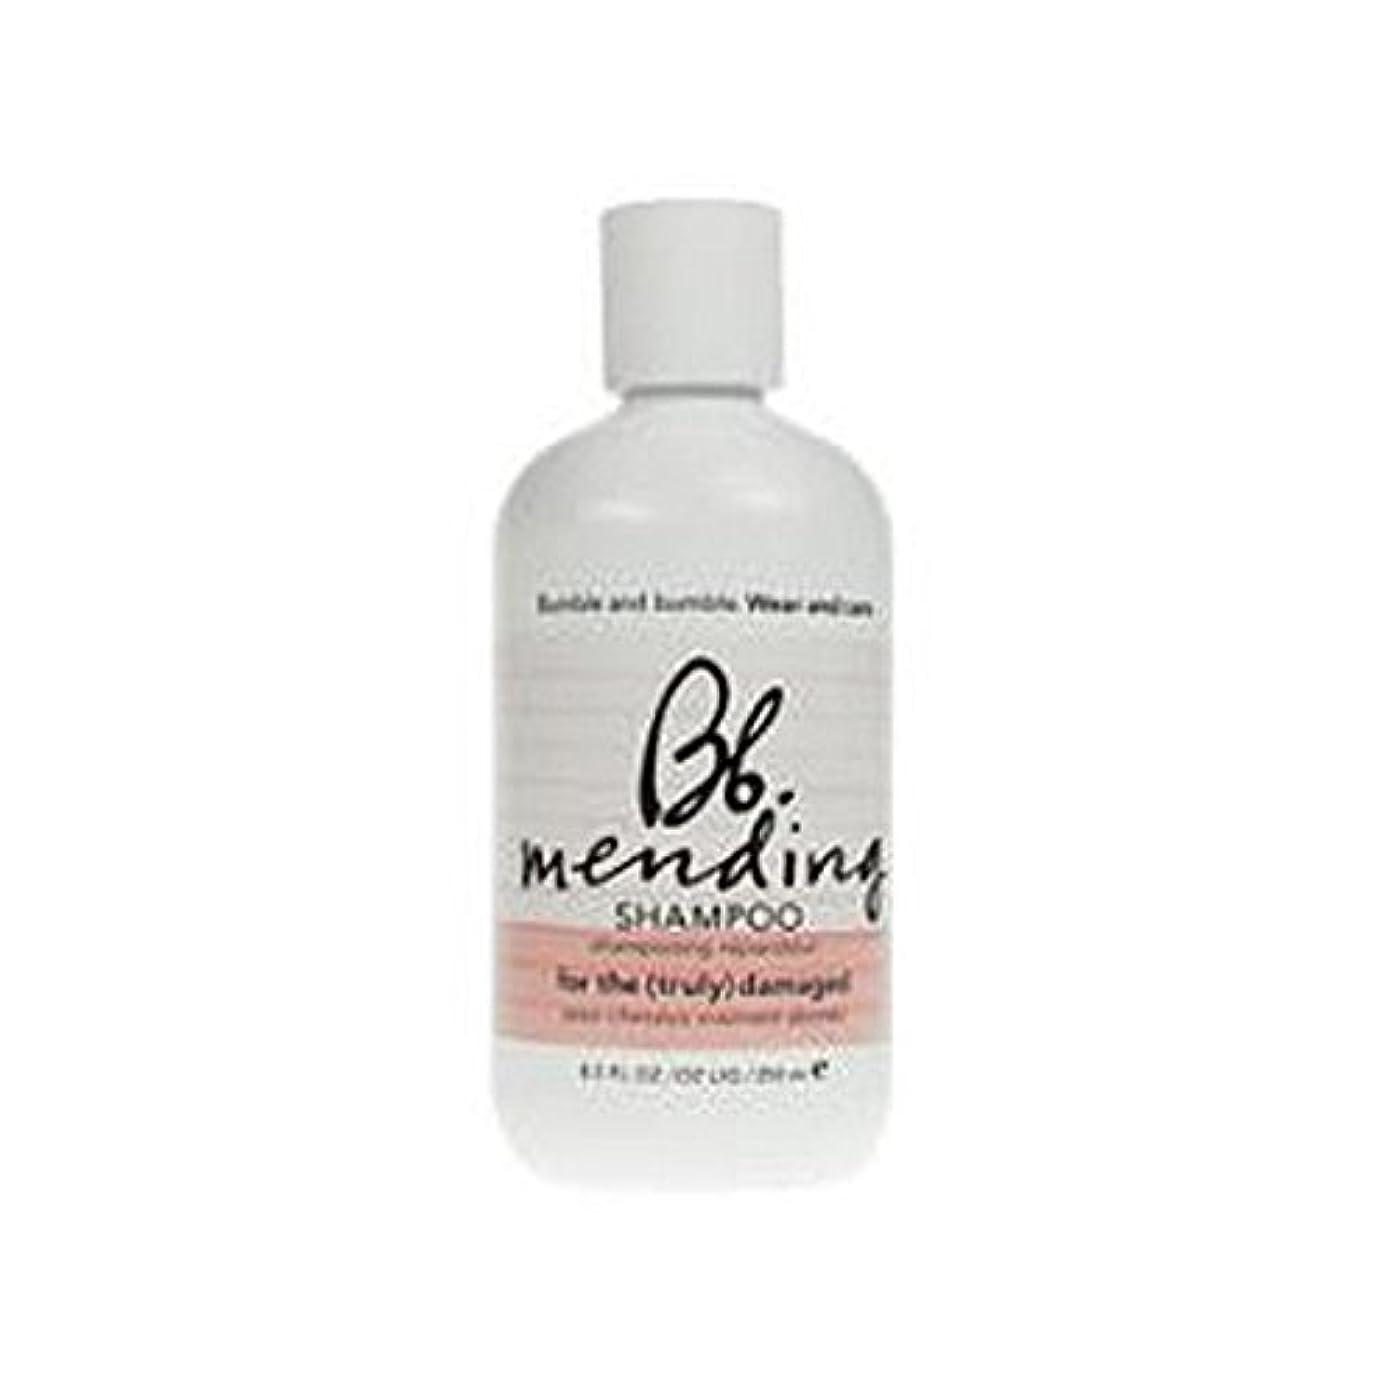 Bumble & Bumble Wear And Care Mending Shampoo (250ml) - 着用し、補修シャンプー(250ミリリットル)を気に [並行輸入品]